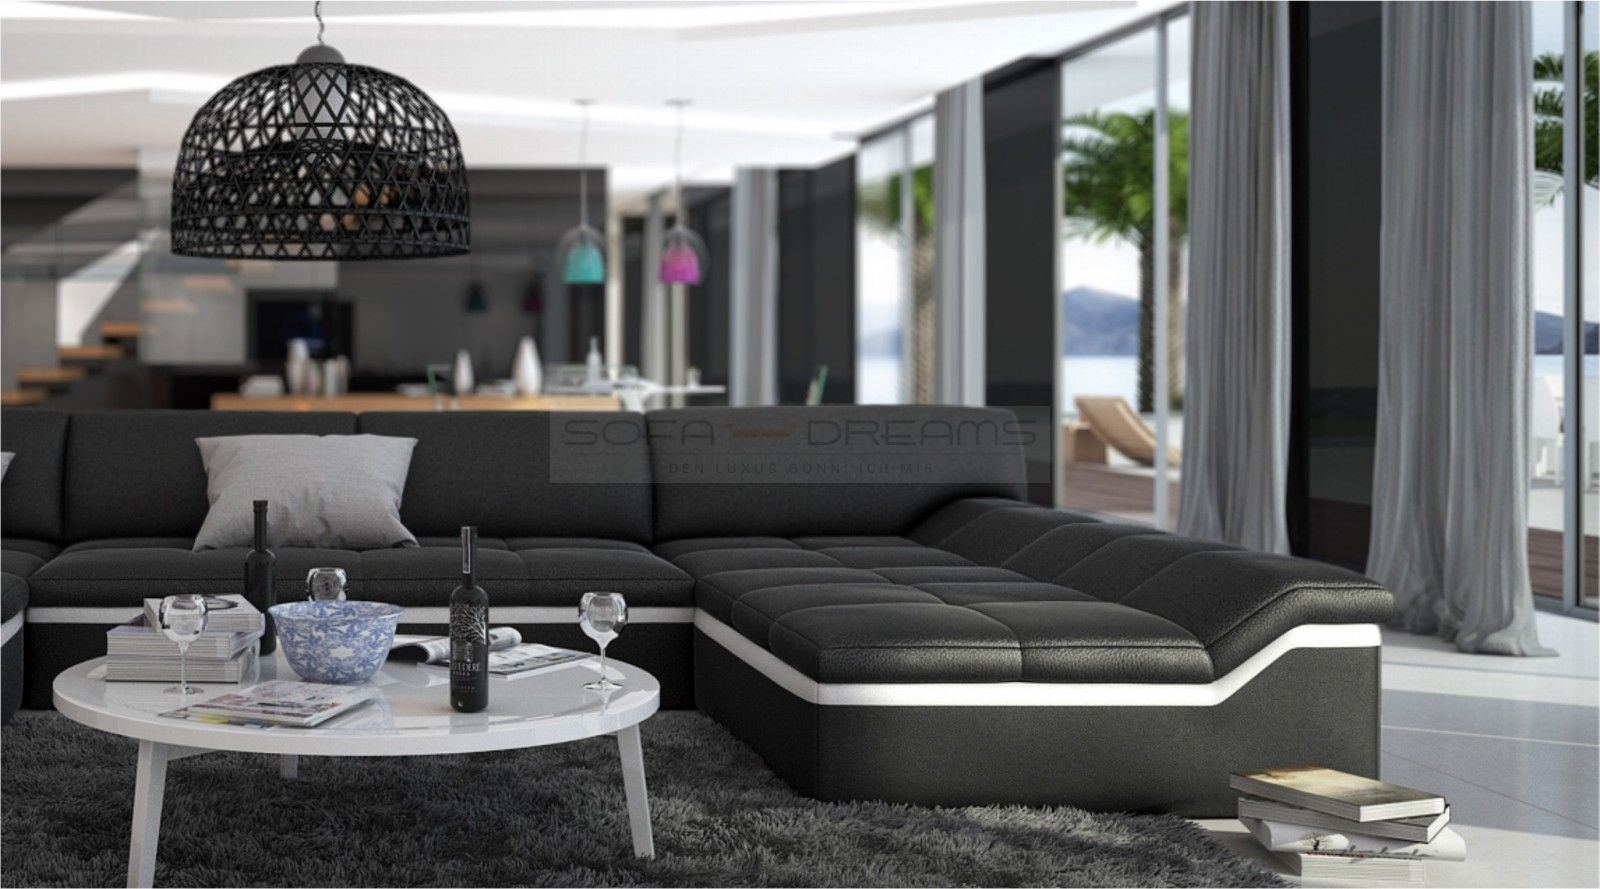 Couch u form modern  MODERNE WOHNLANDSCHAFT BARARI U FORM SOFA DESIGN COUCH RELAXSOFA ...